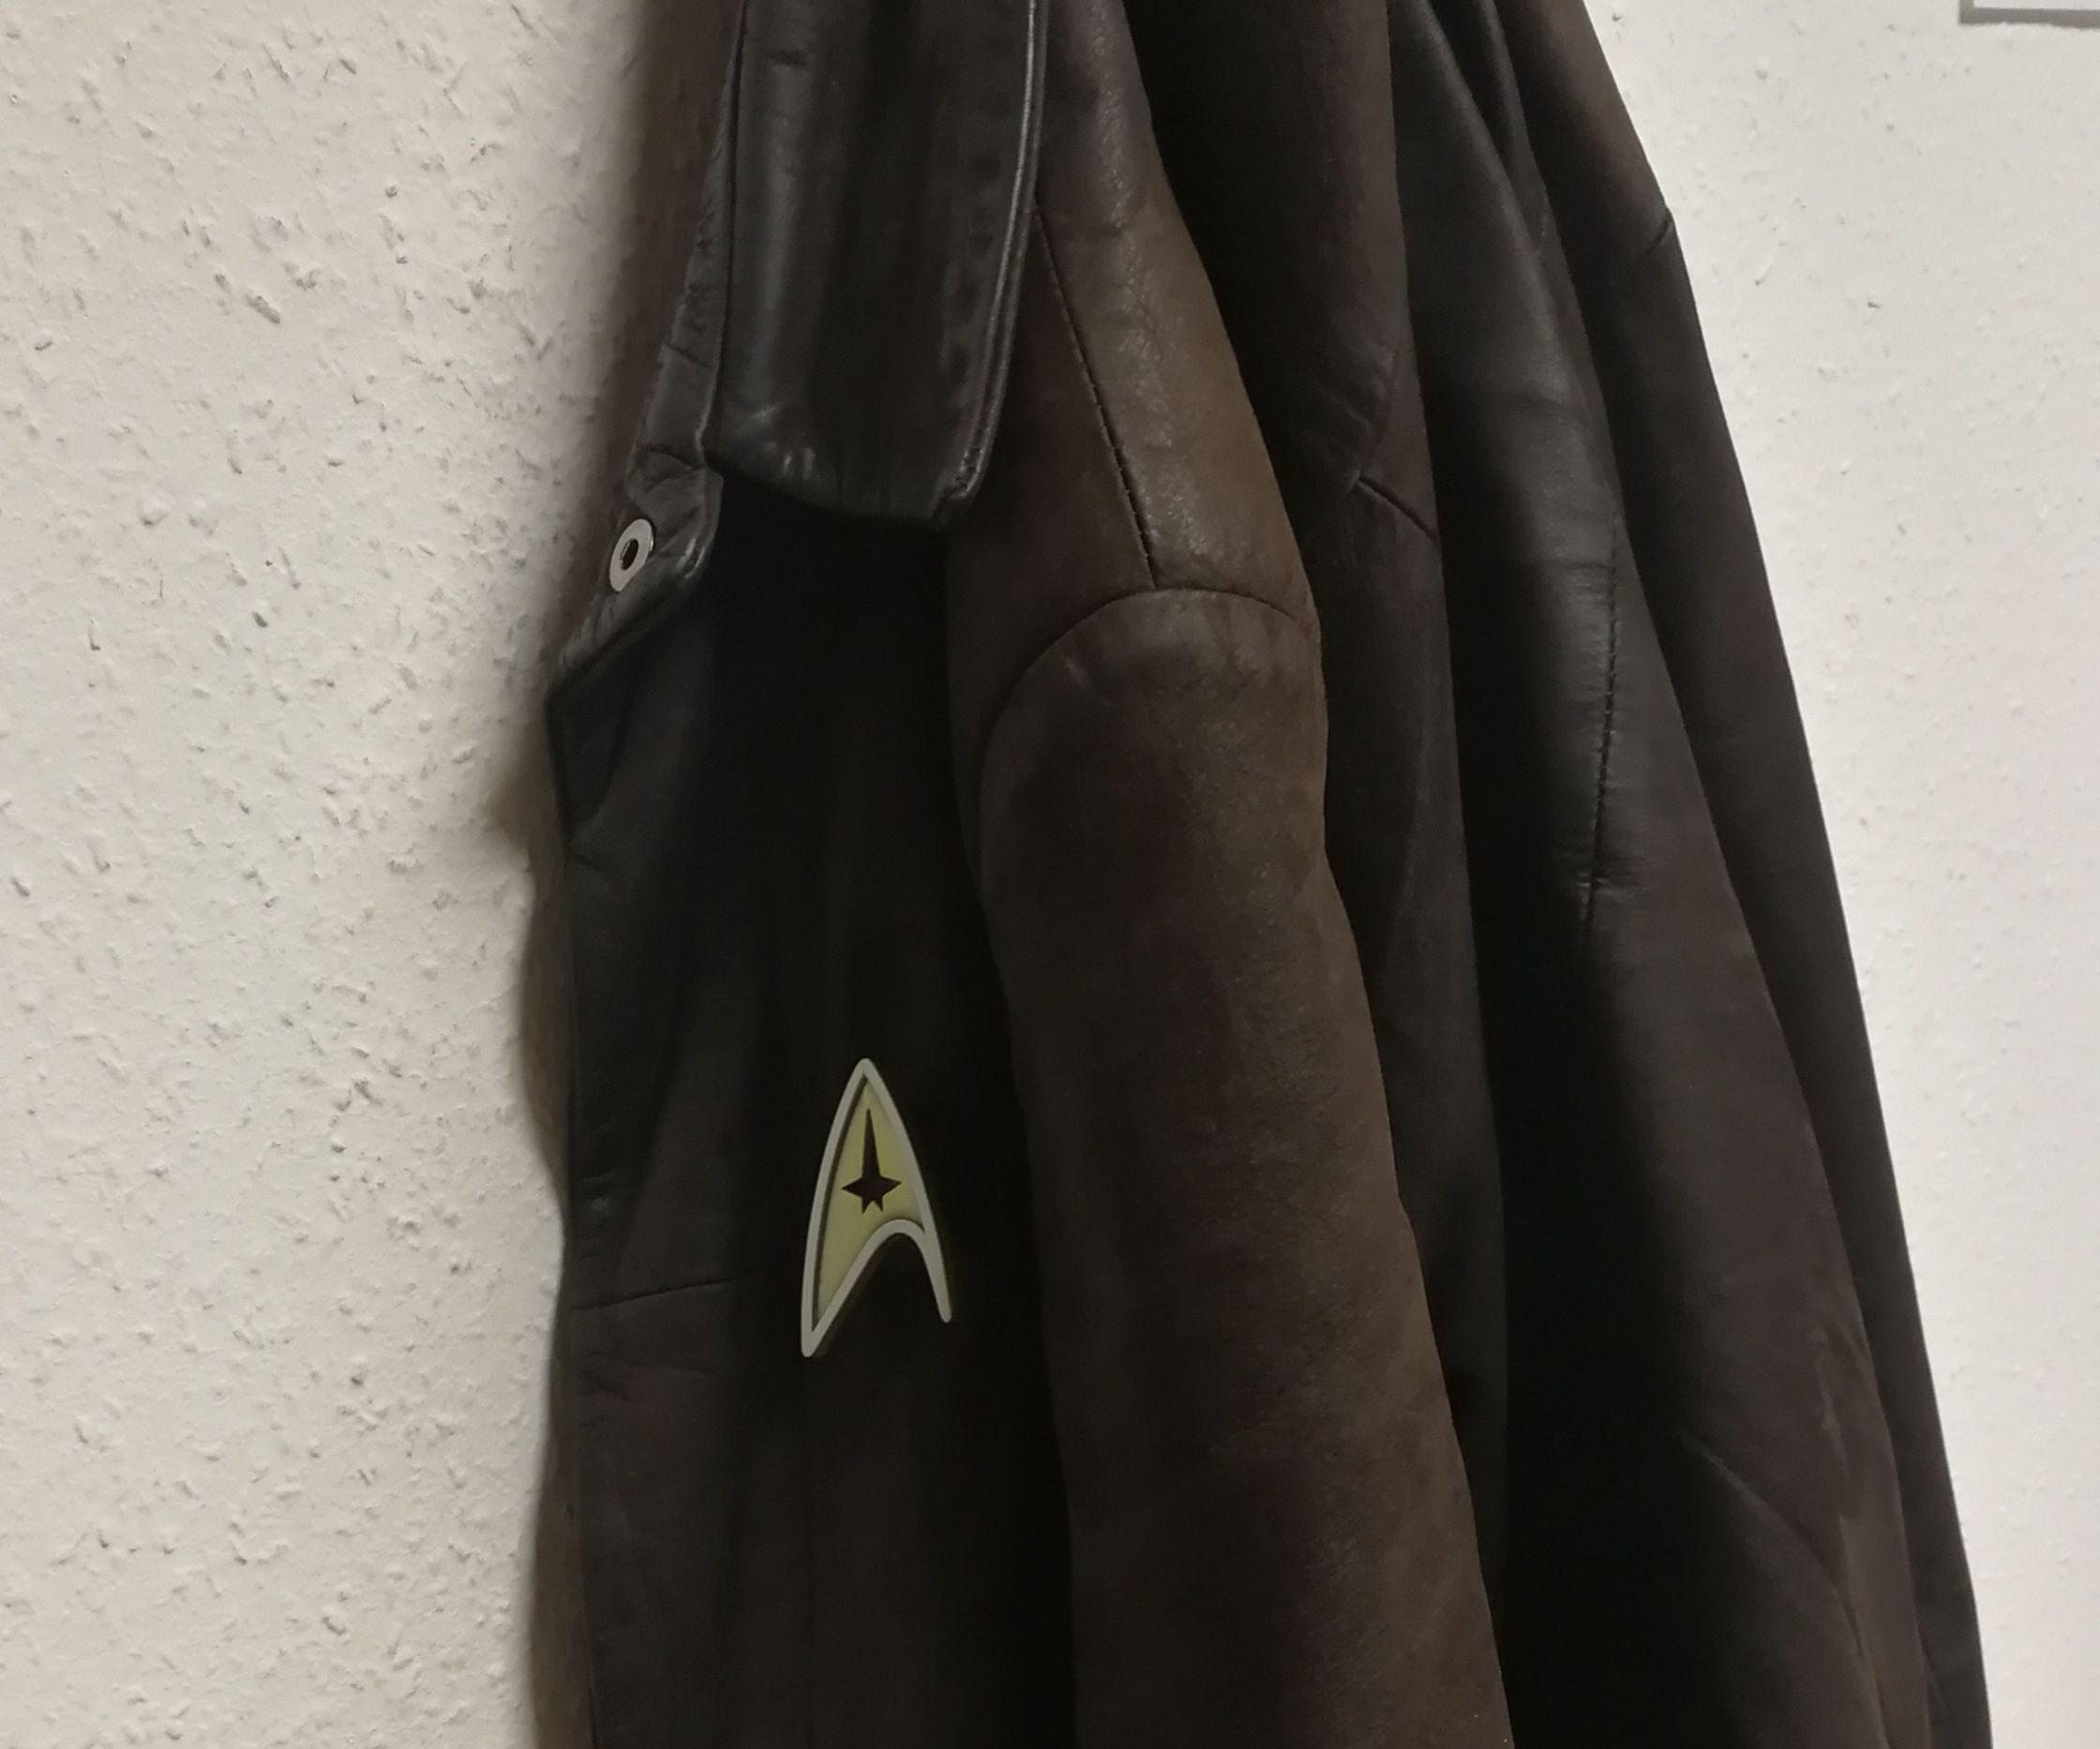 Star Trek Communicator Pin/Badge With Audio: 6 Steps